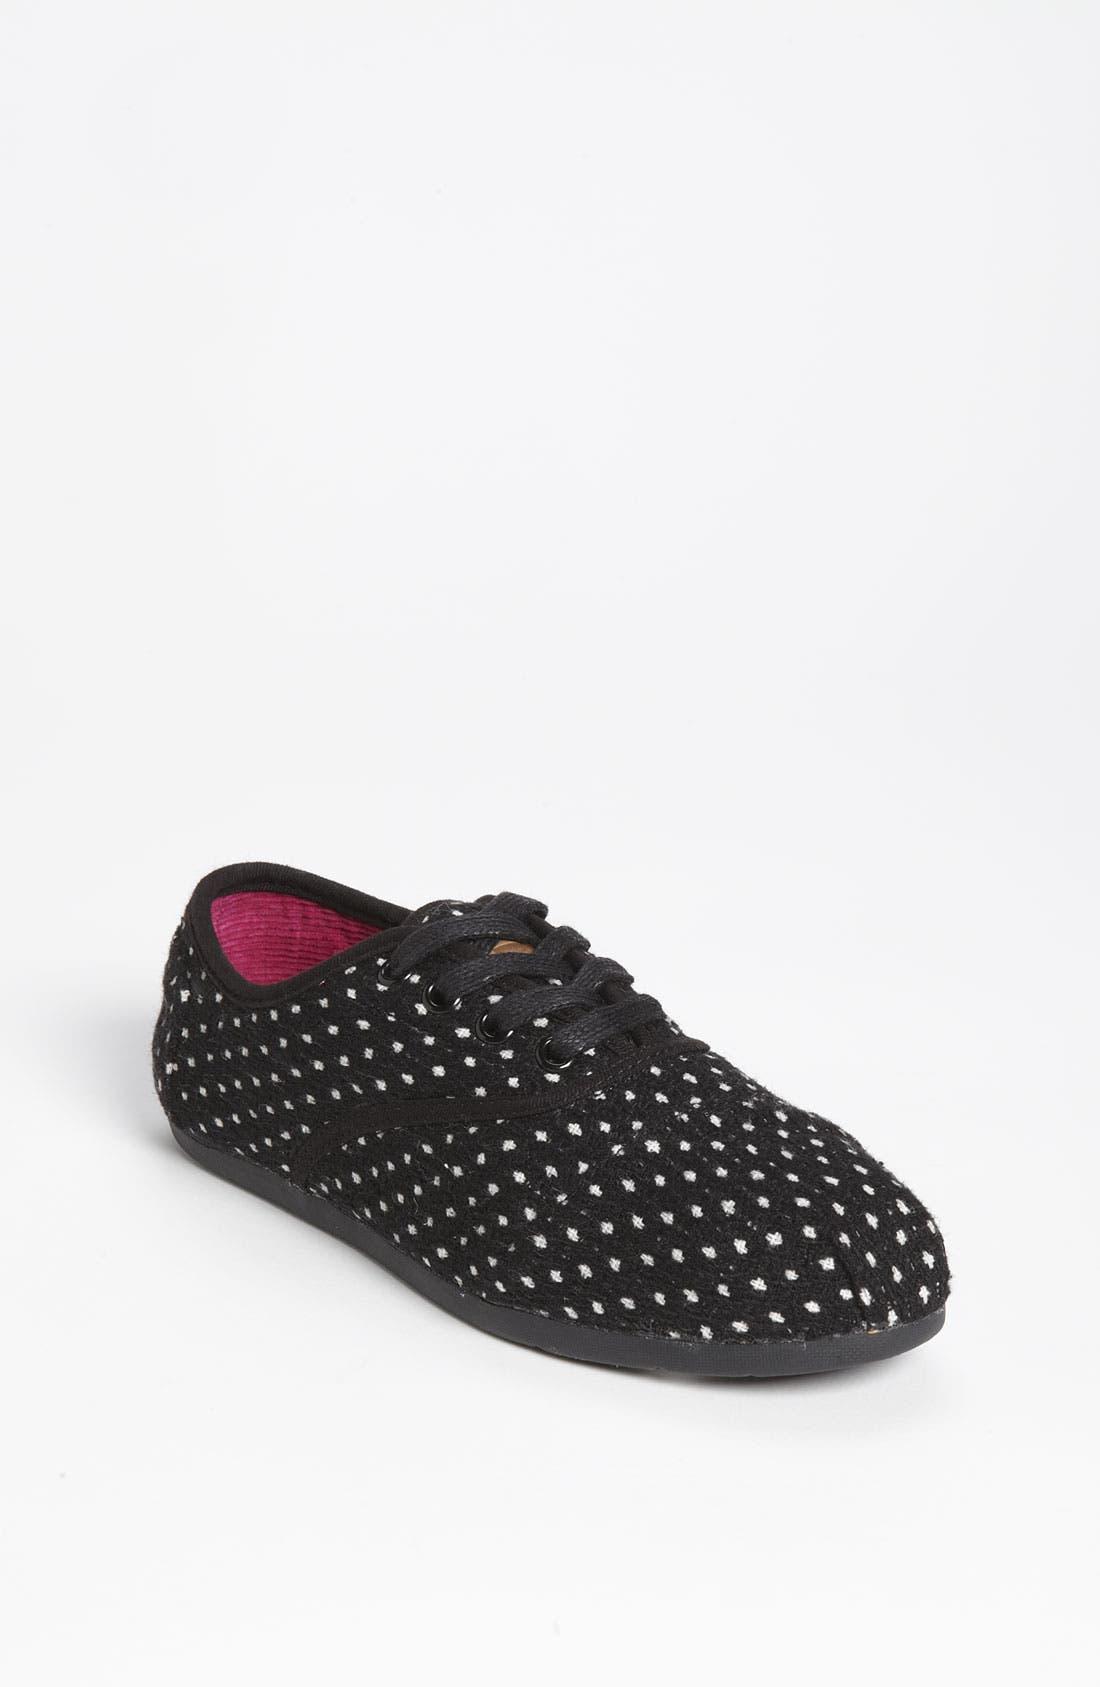 Main Image - TOMS 'Cordones - Dots' Slip-On (Women)